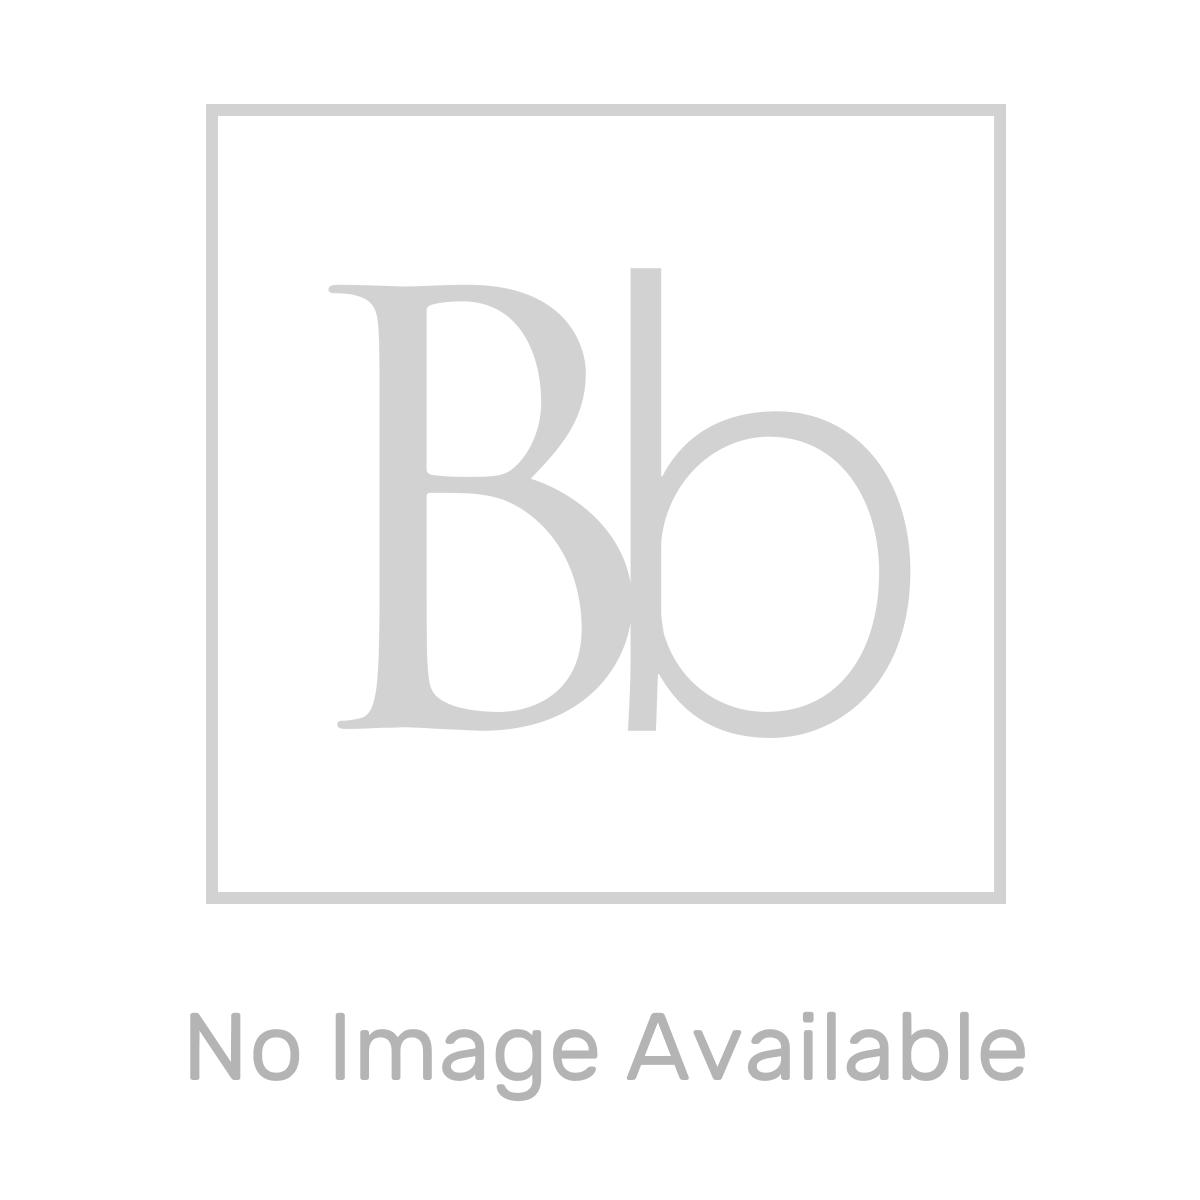 RAK Surface Greige Lappato Tile 600 x 600mm Lifestyle